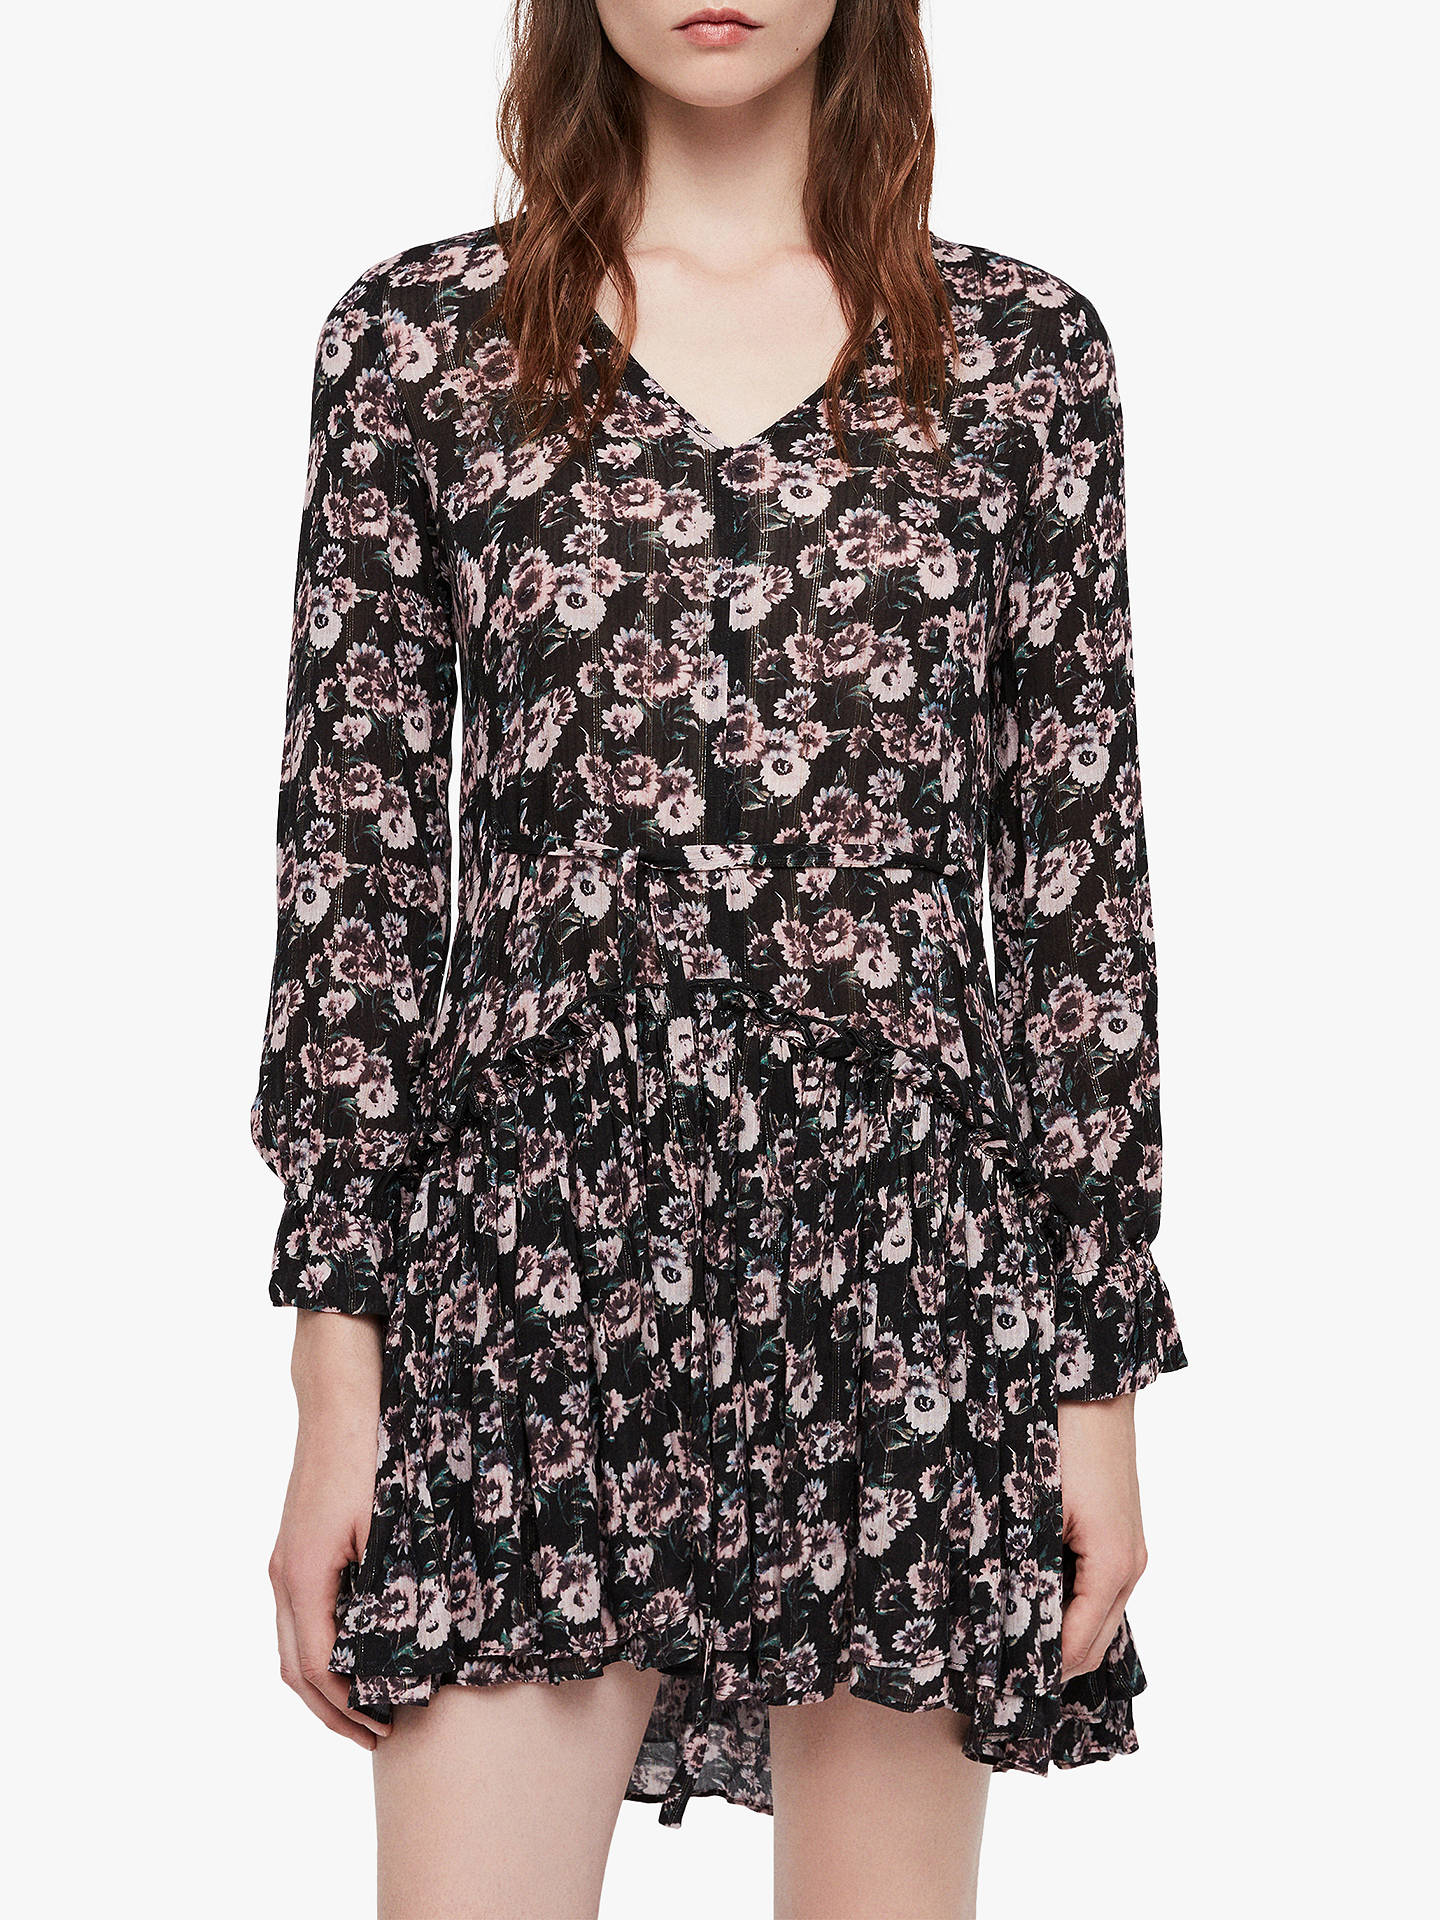 c297e9a9b54bc Buy AllSaints Alia Odile Dress, Black, L Online at johnlewis.com ...